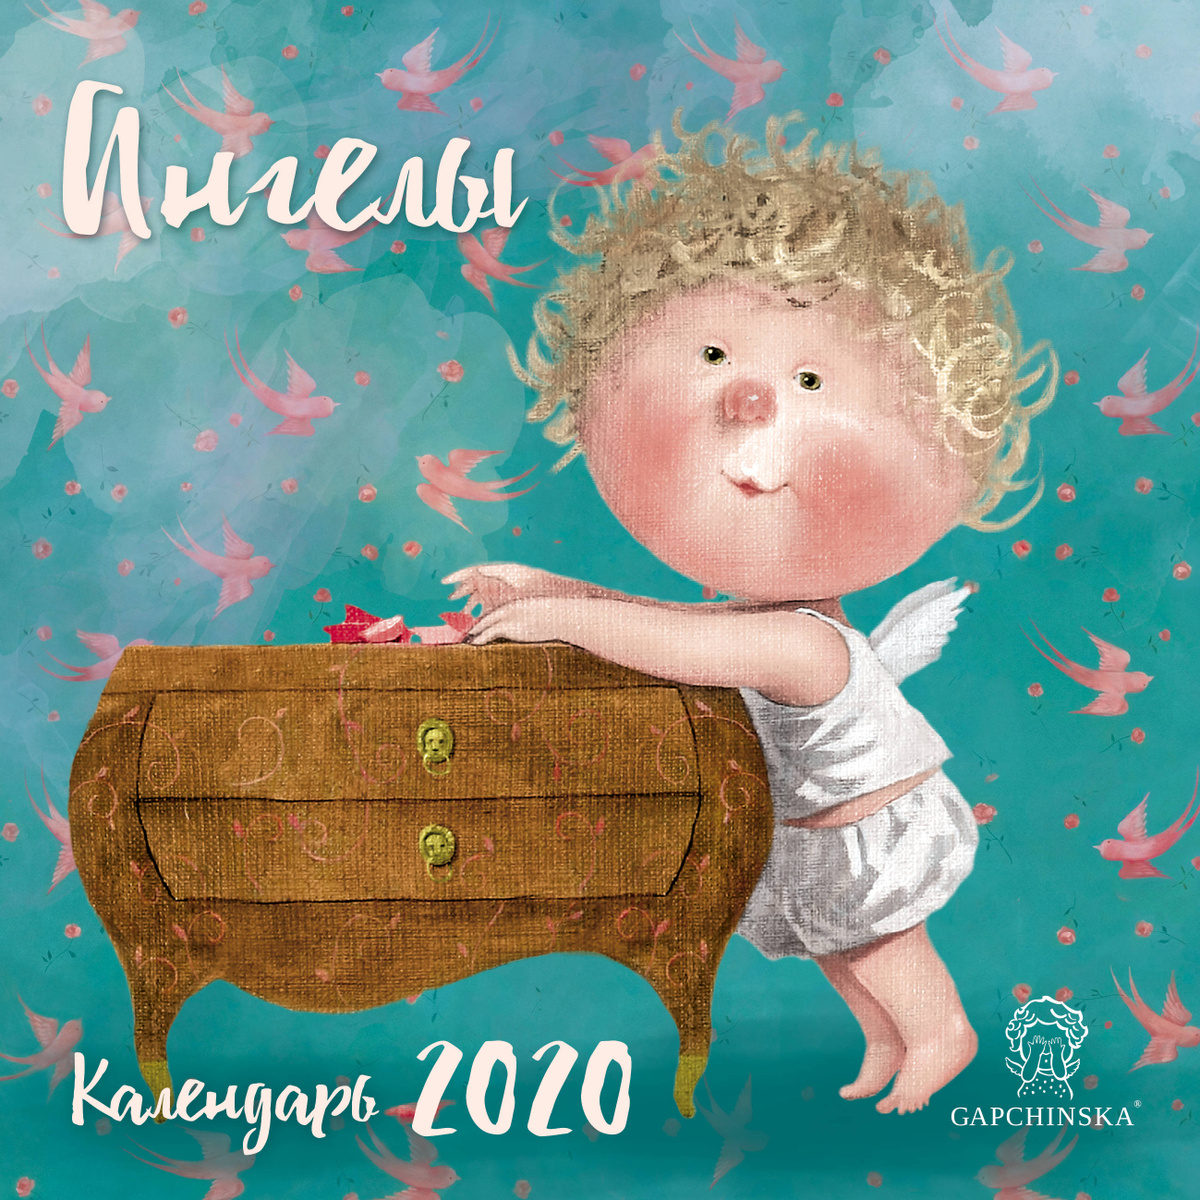 Гапчинская. Ангелы. Календарь настенный на 2020 год (300х300 мм)  #1